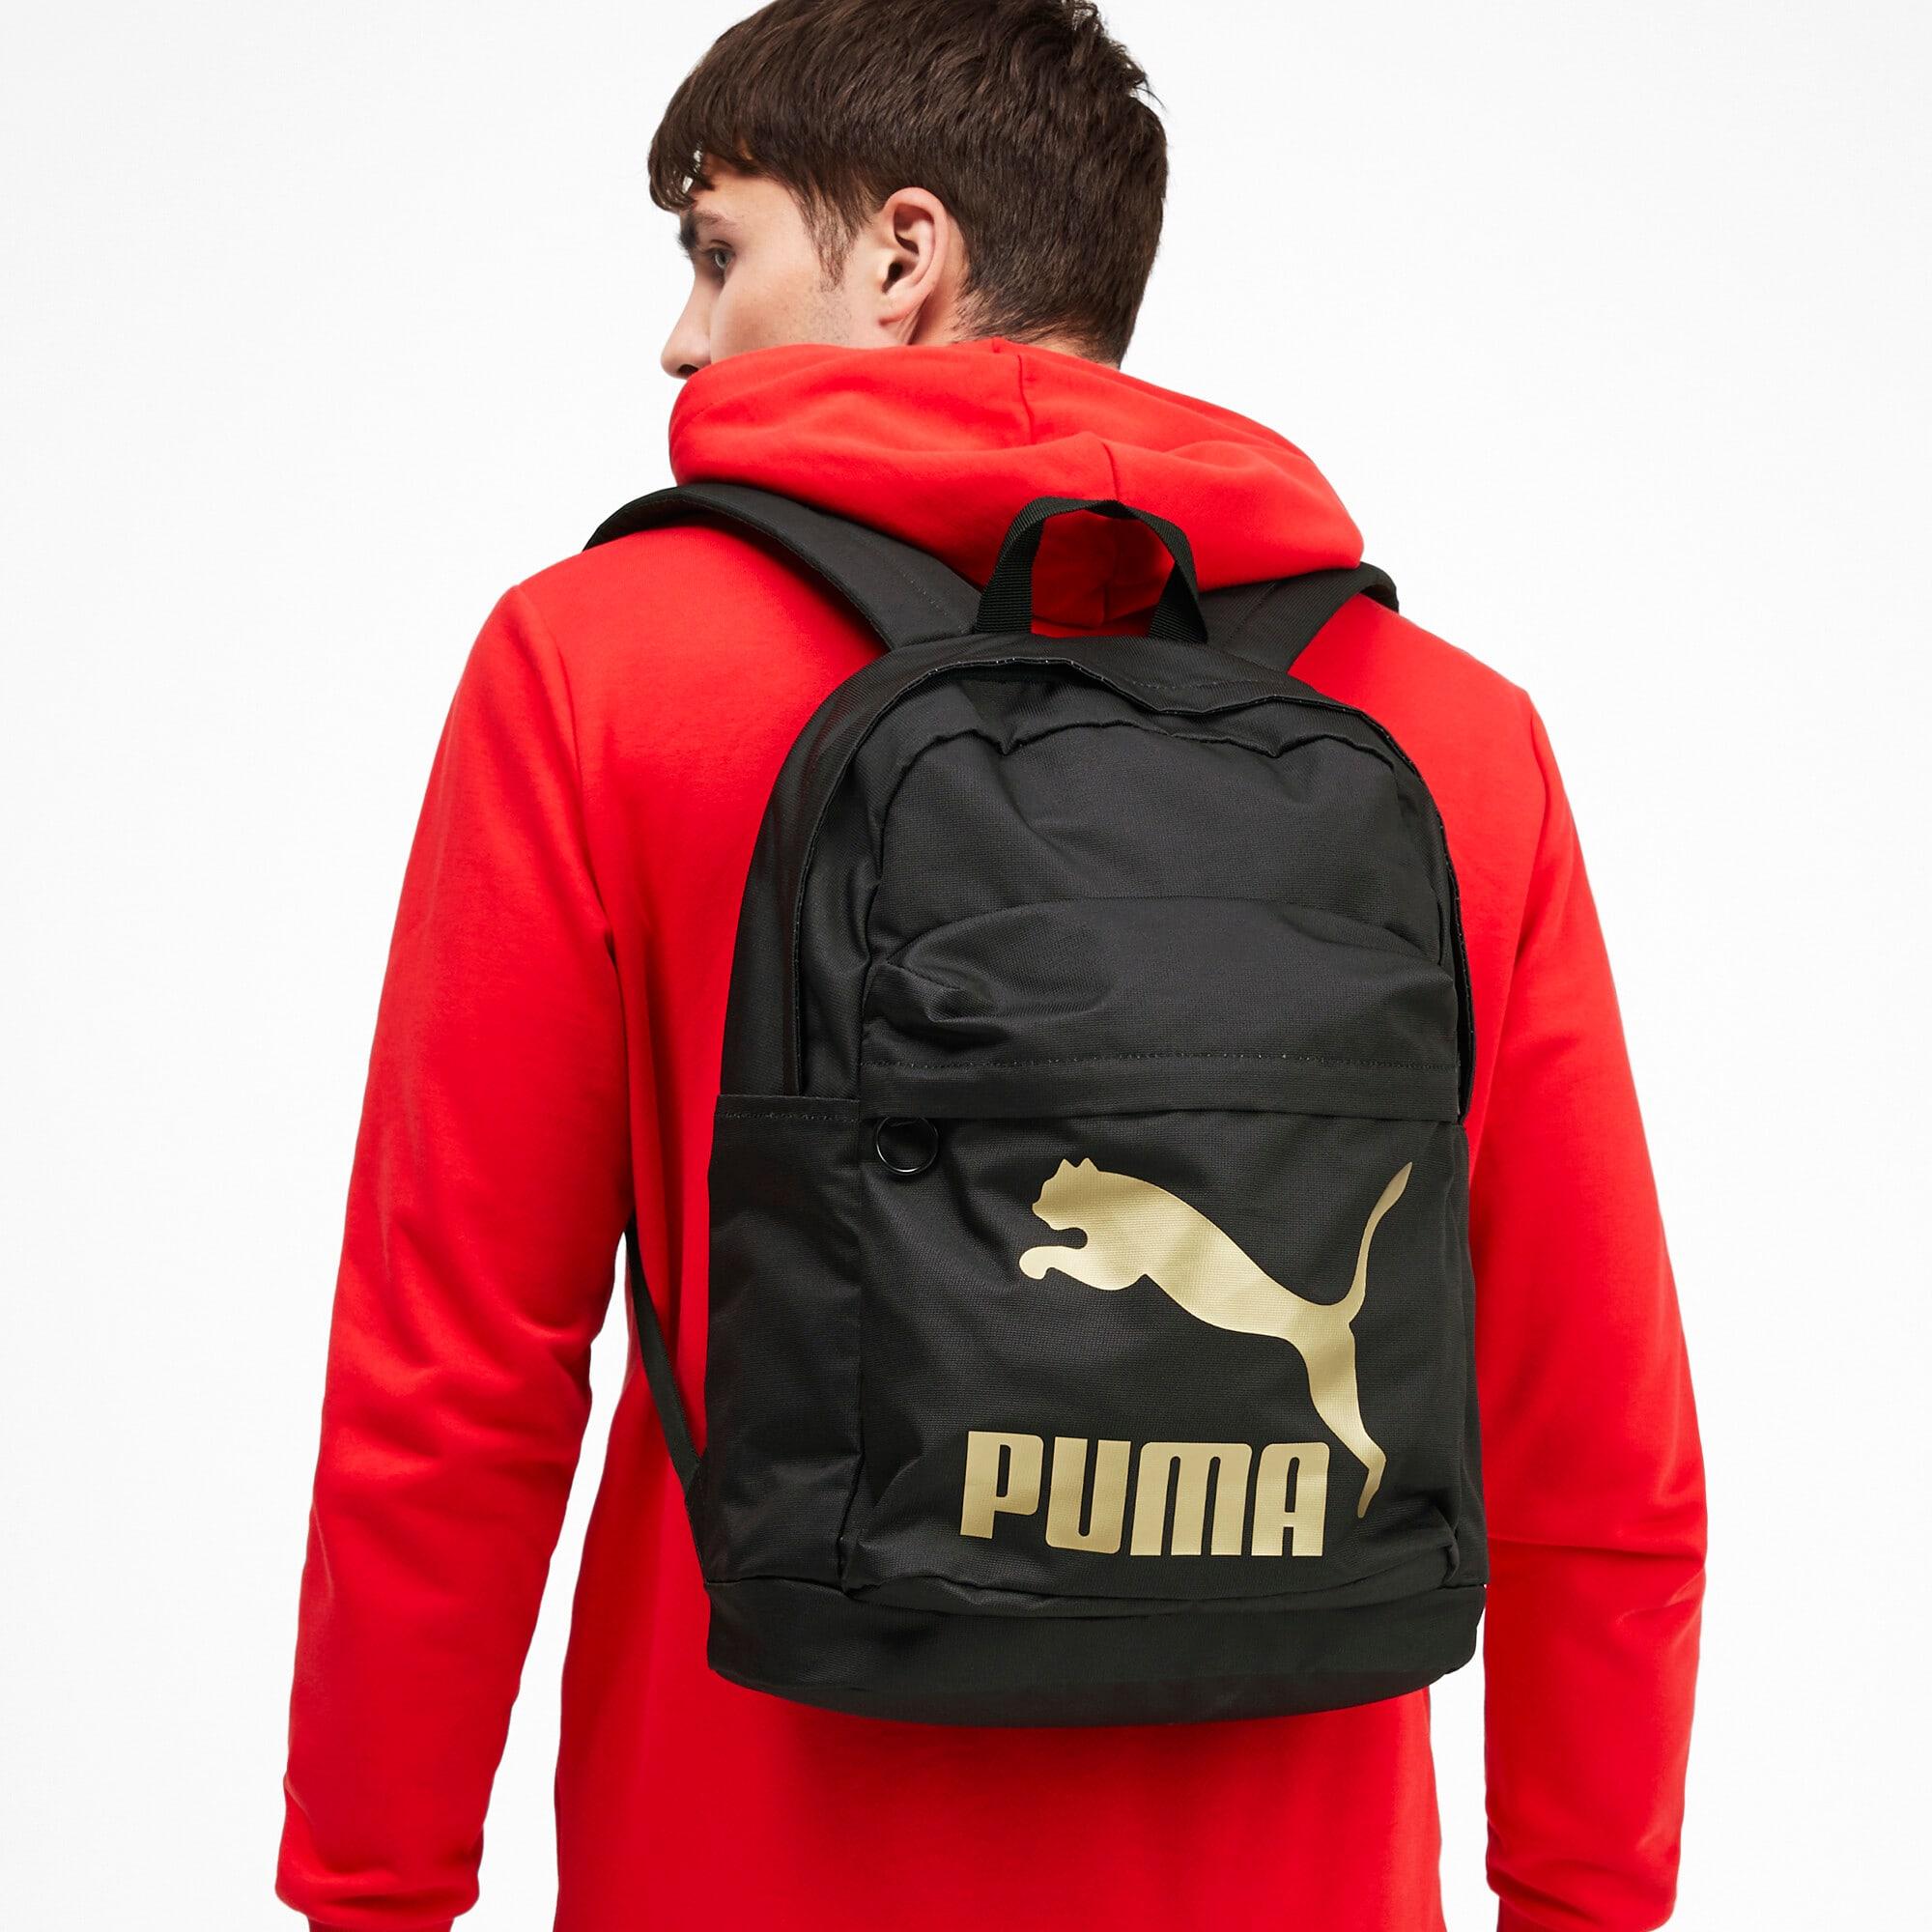 Thumbnail 2 of オリジナルス バックパック 20L, Puma Black, medium-JPN